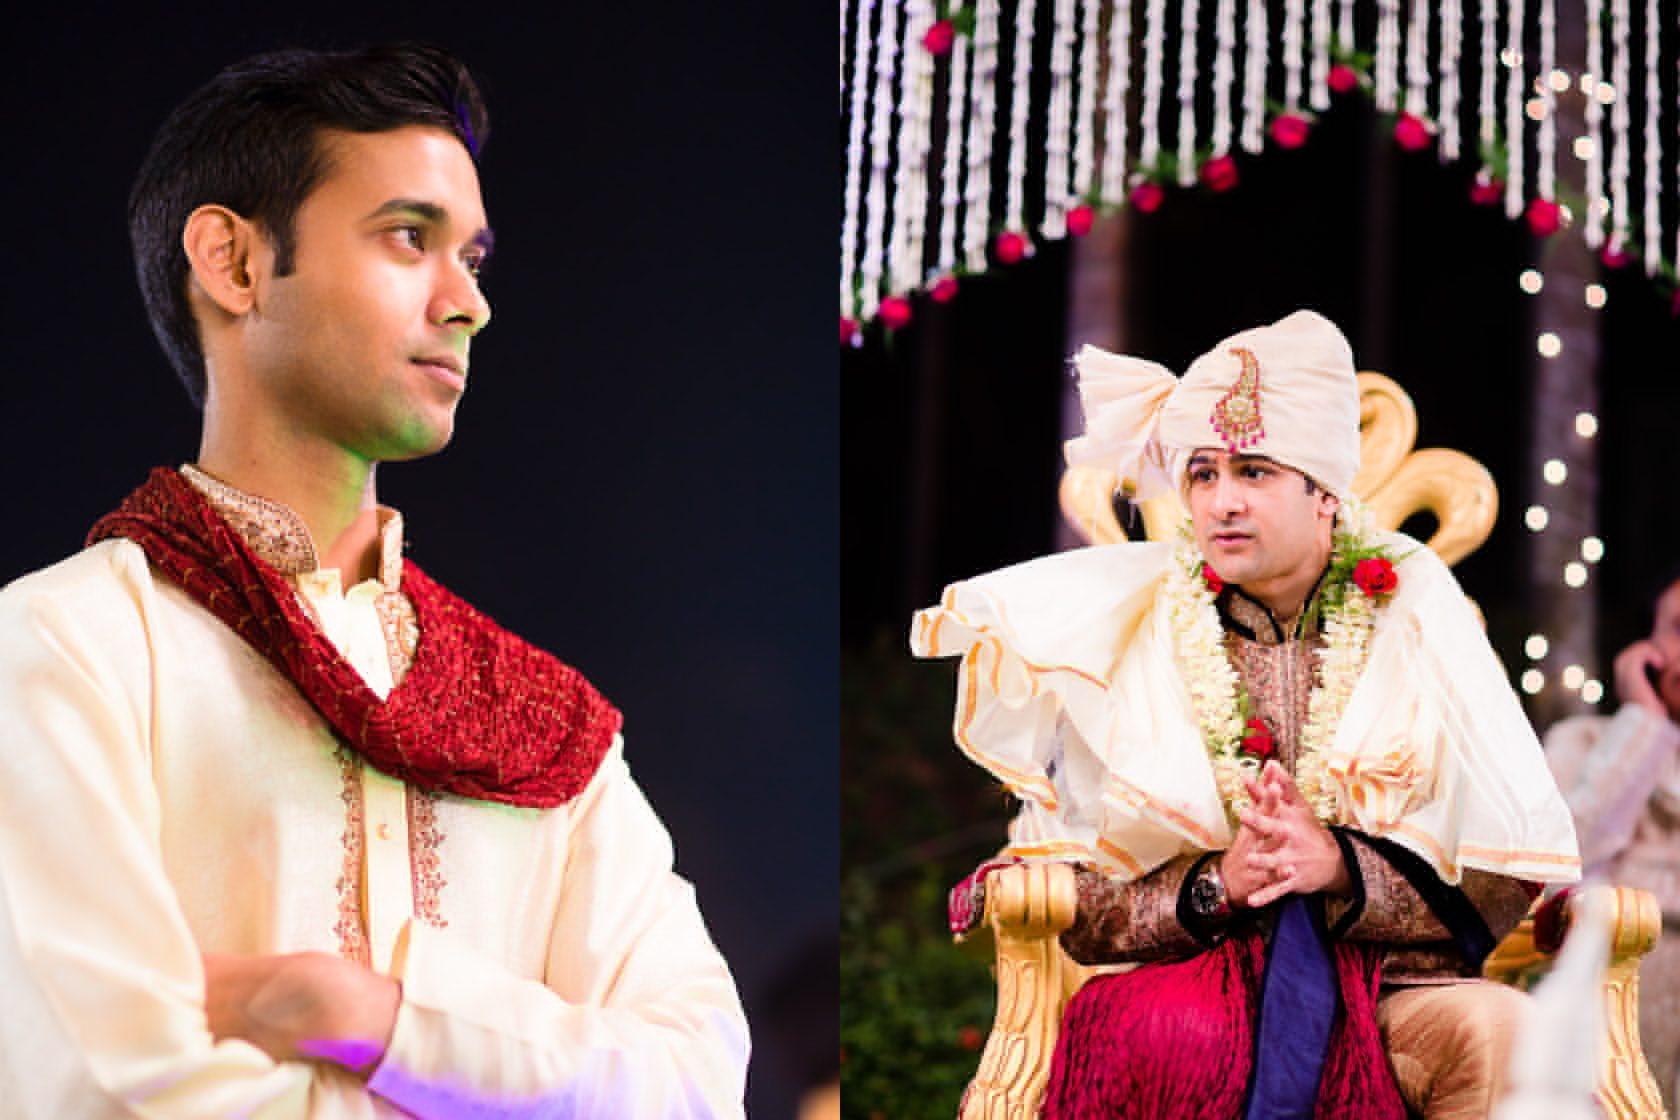 India_Wedding_139.jpg